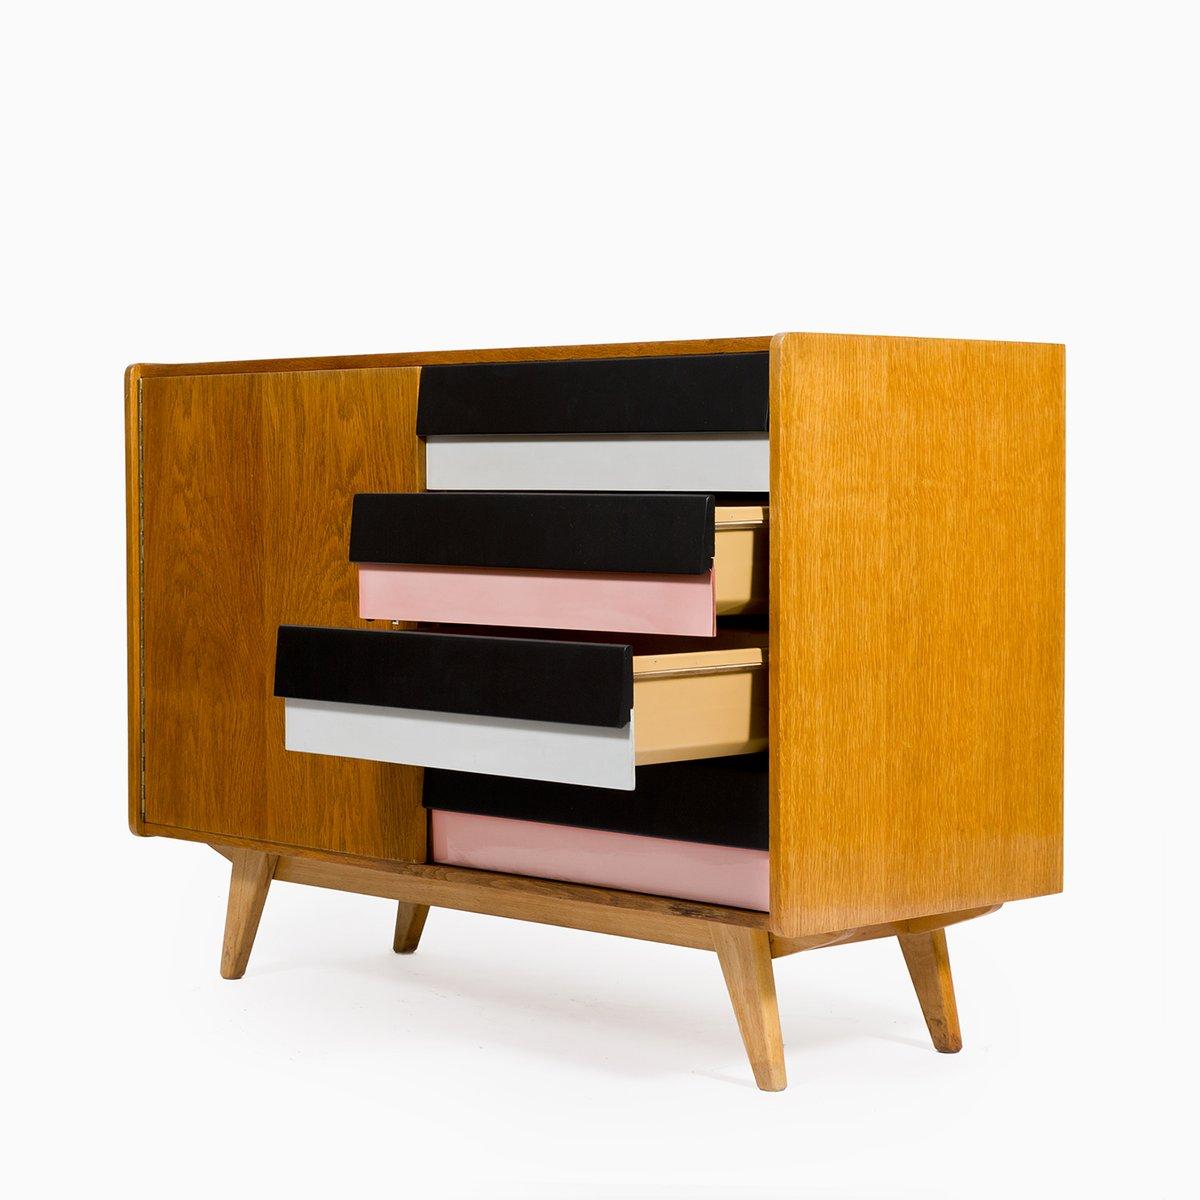 mid century kommode u 458 von jiri jiroutek f r interier praha bei pamono kaufen. Black Bedroom Furniture Sets. Home Design Ideas